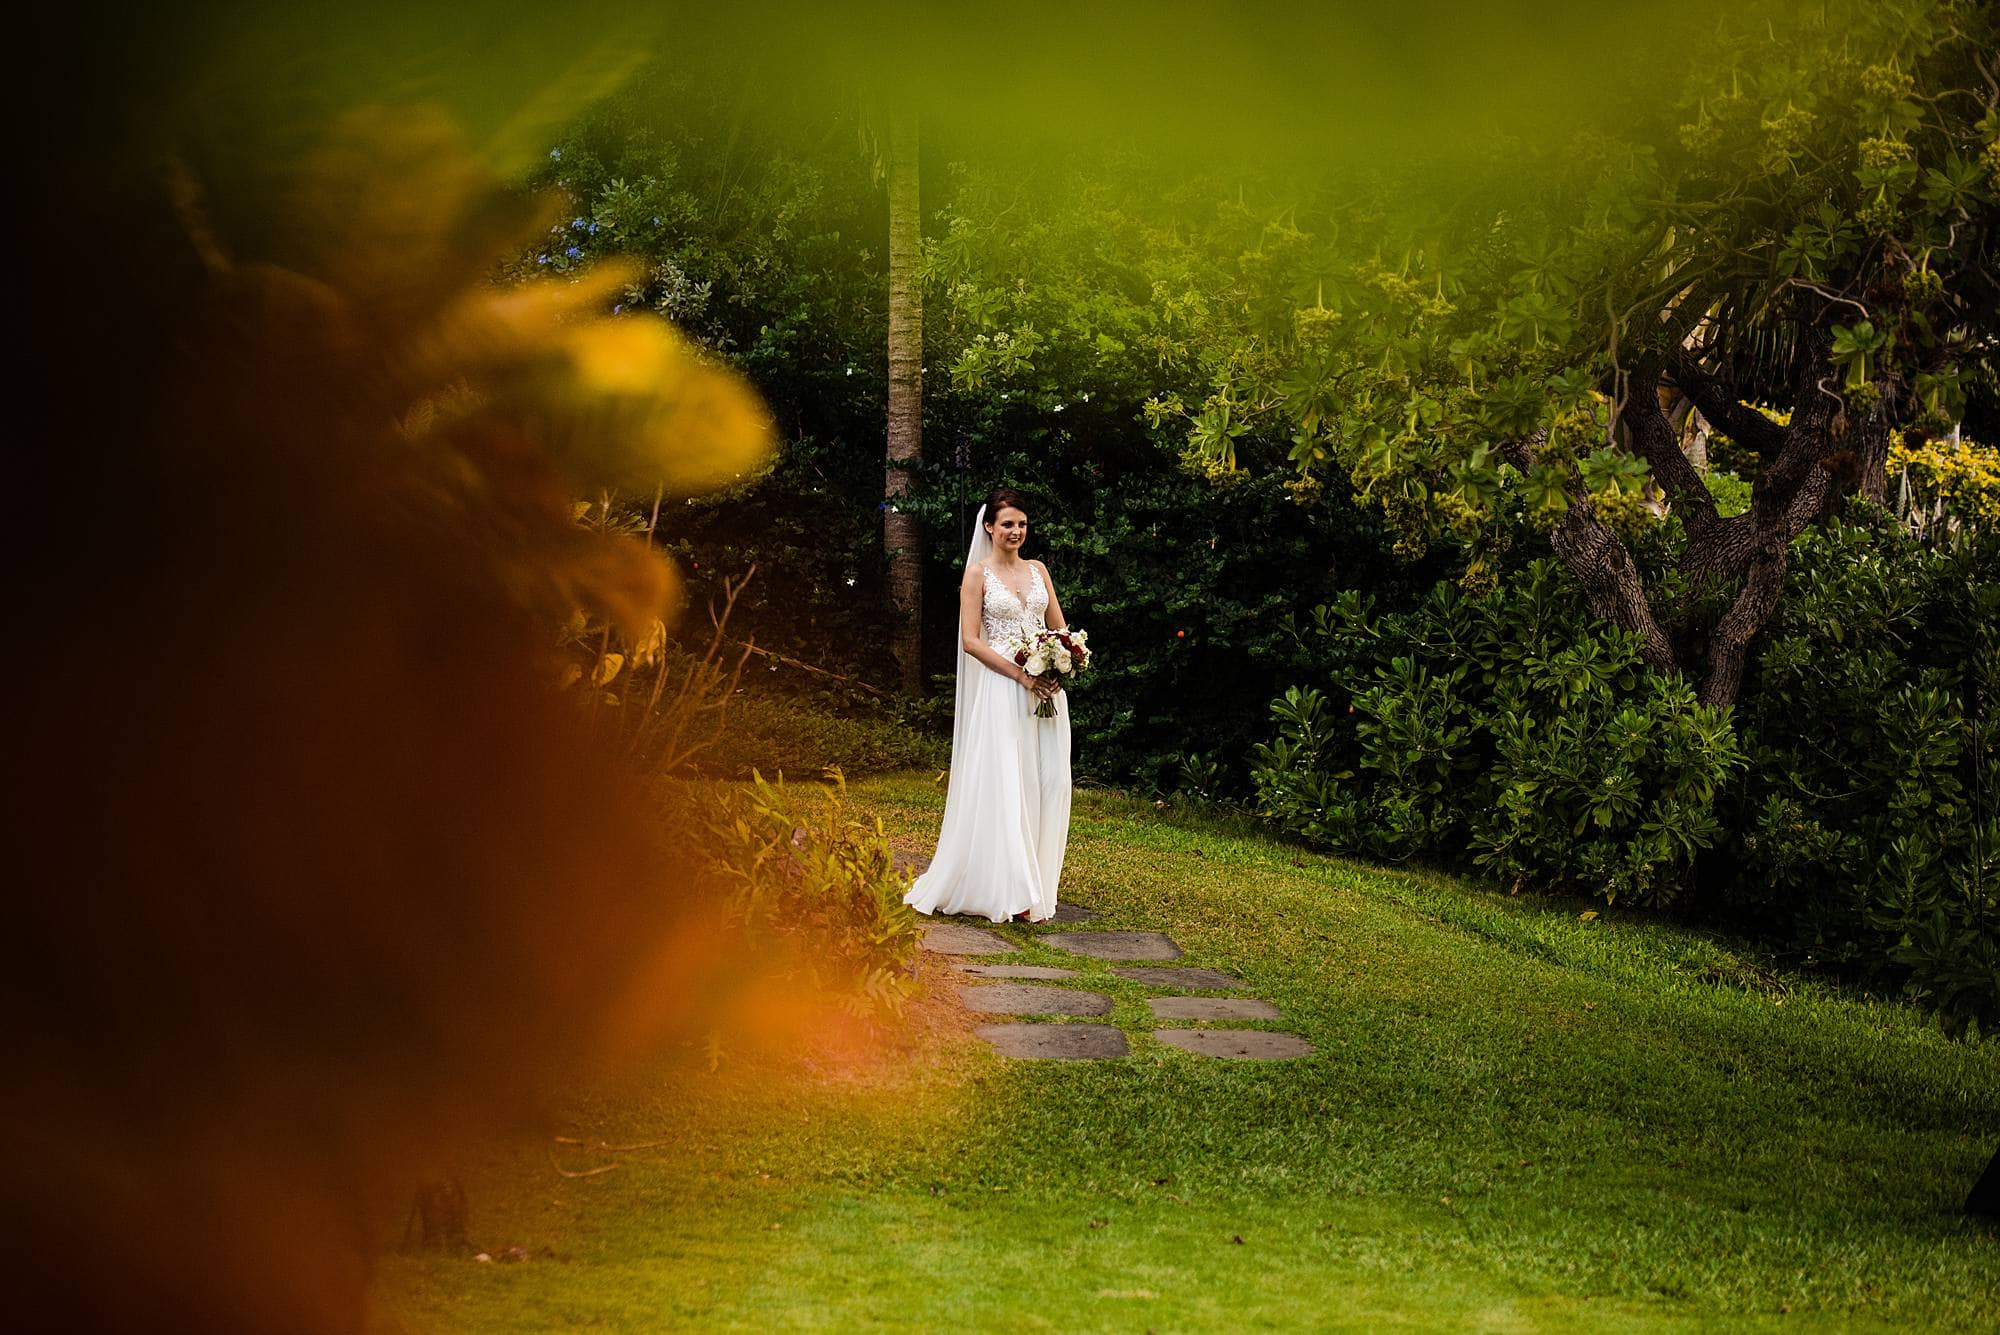 bride walking herself down the aisle